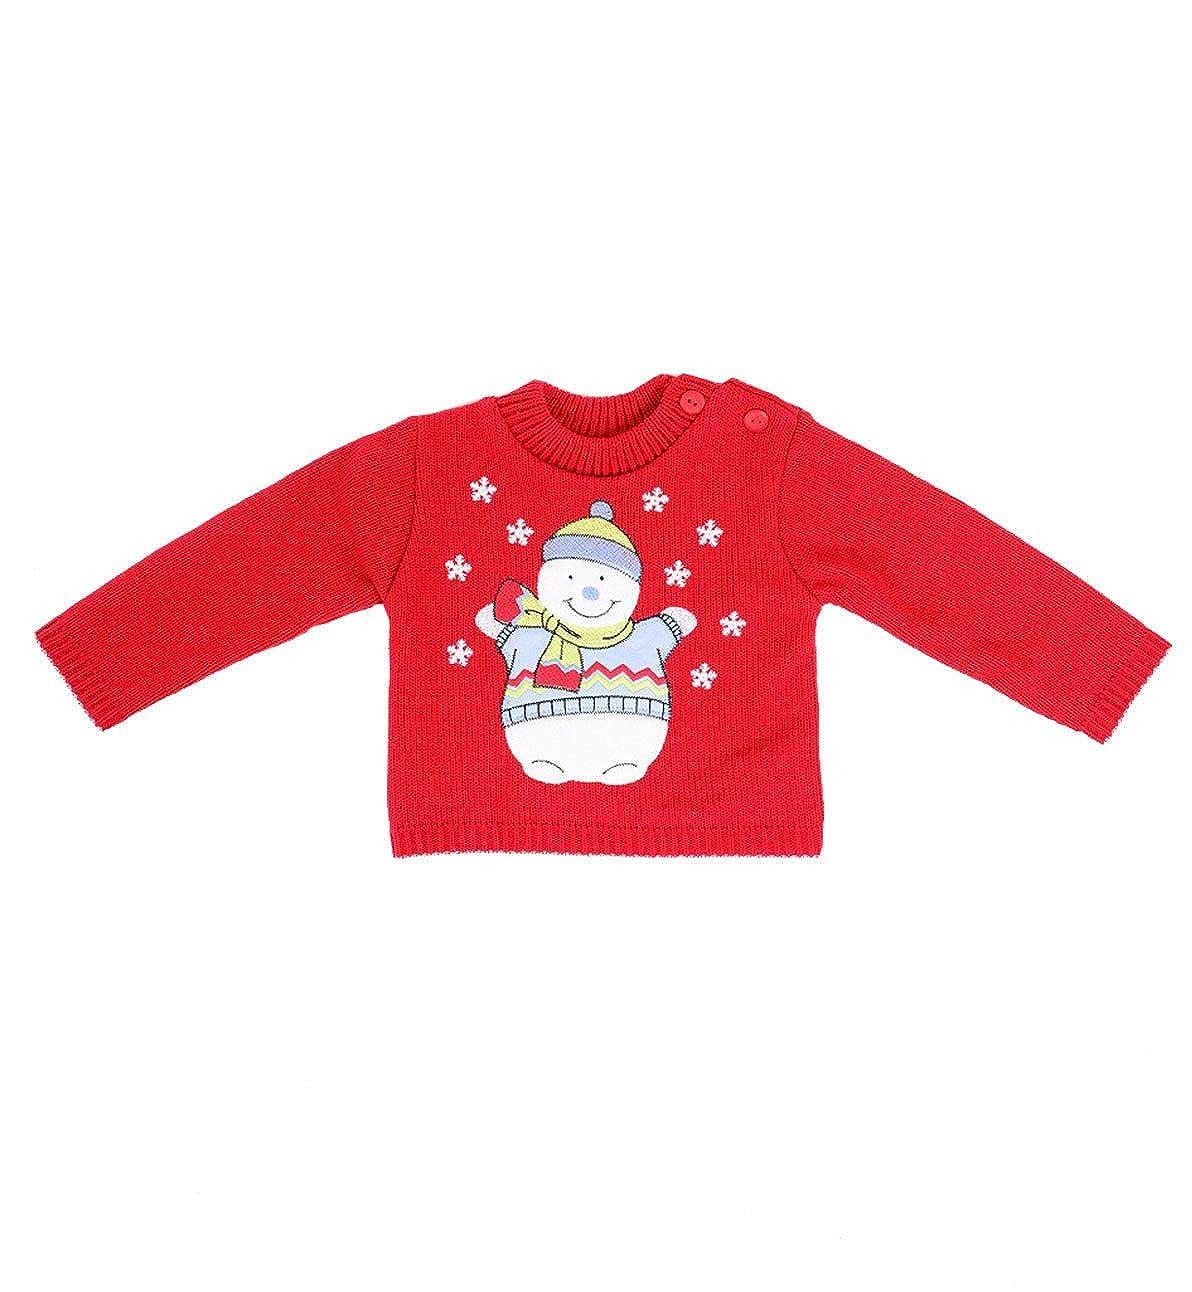 adam & eesa Kids Baby Boys Girls Winter Festive Christmas Jumpers Sweaters 11 Xmas Designs Ages 0-2 Years